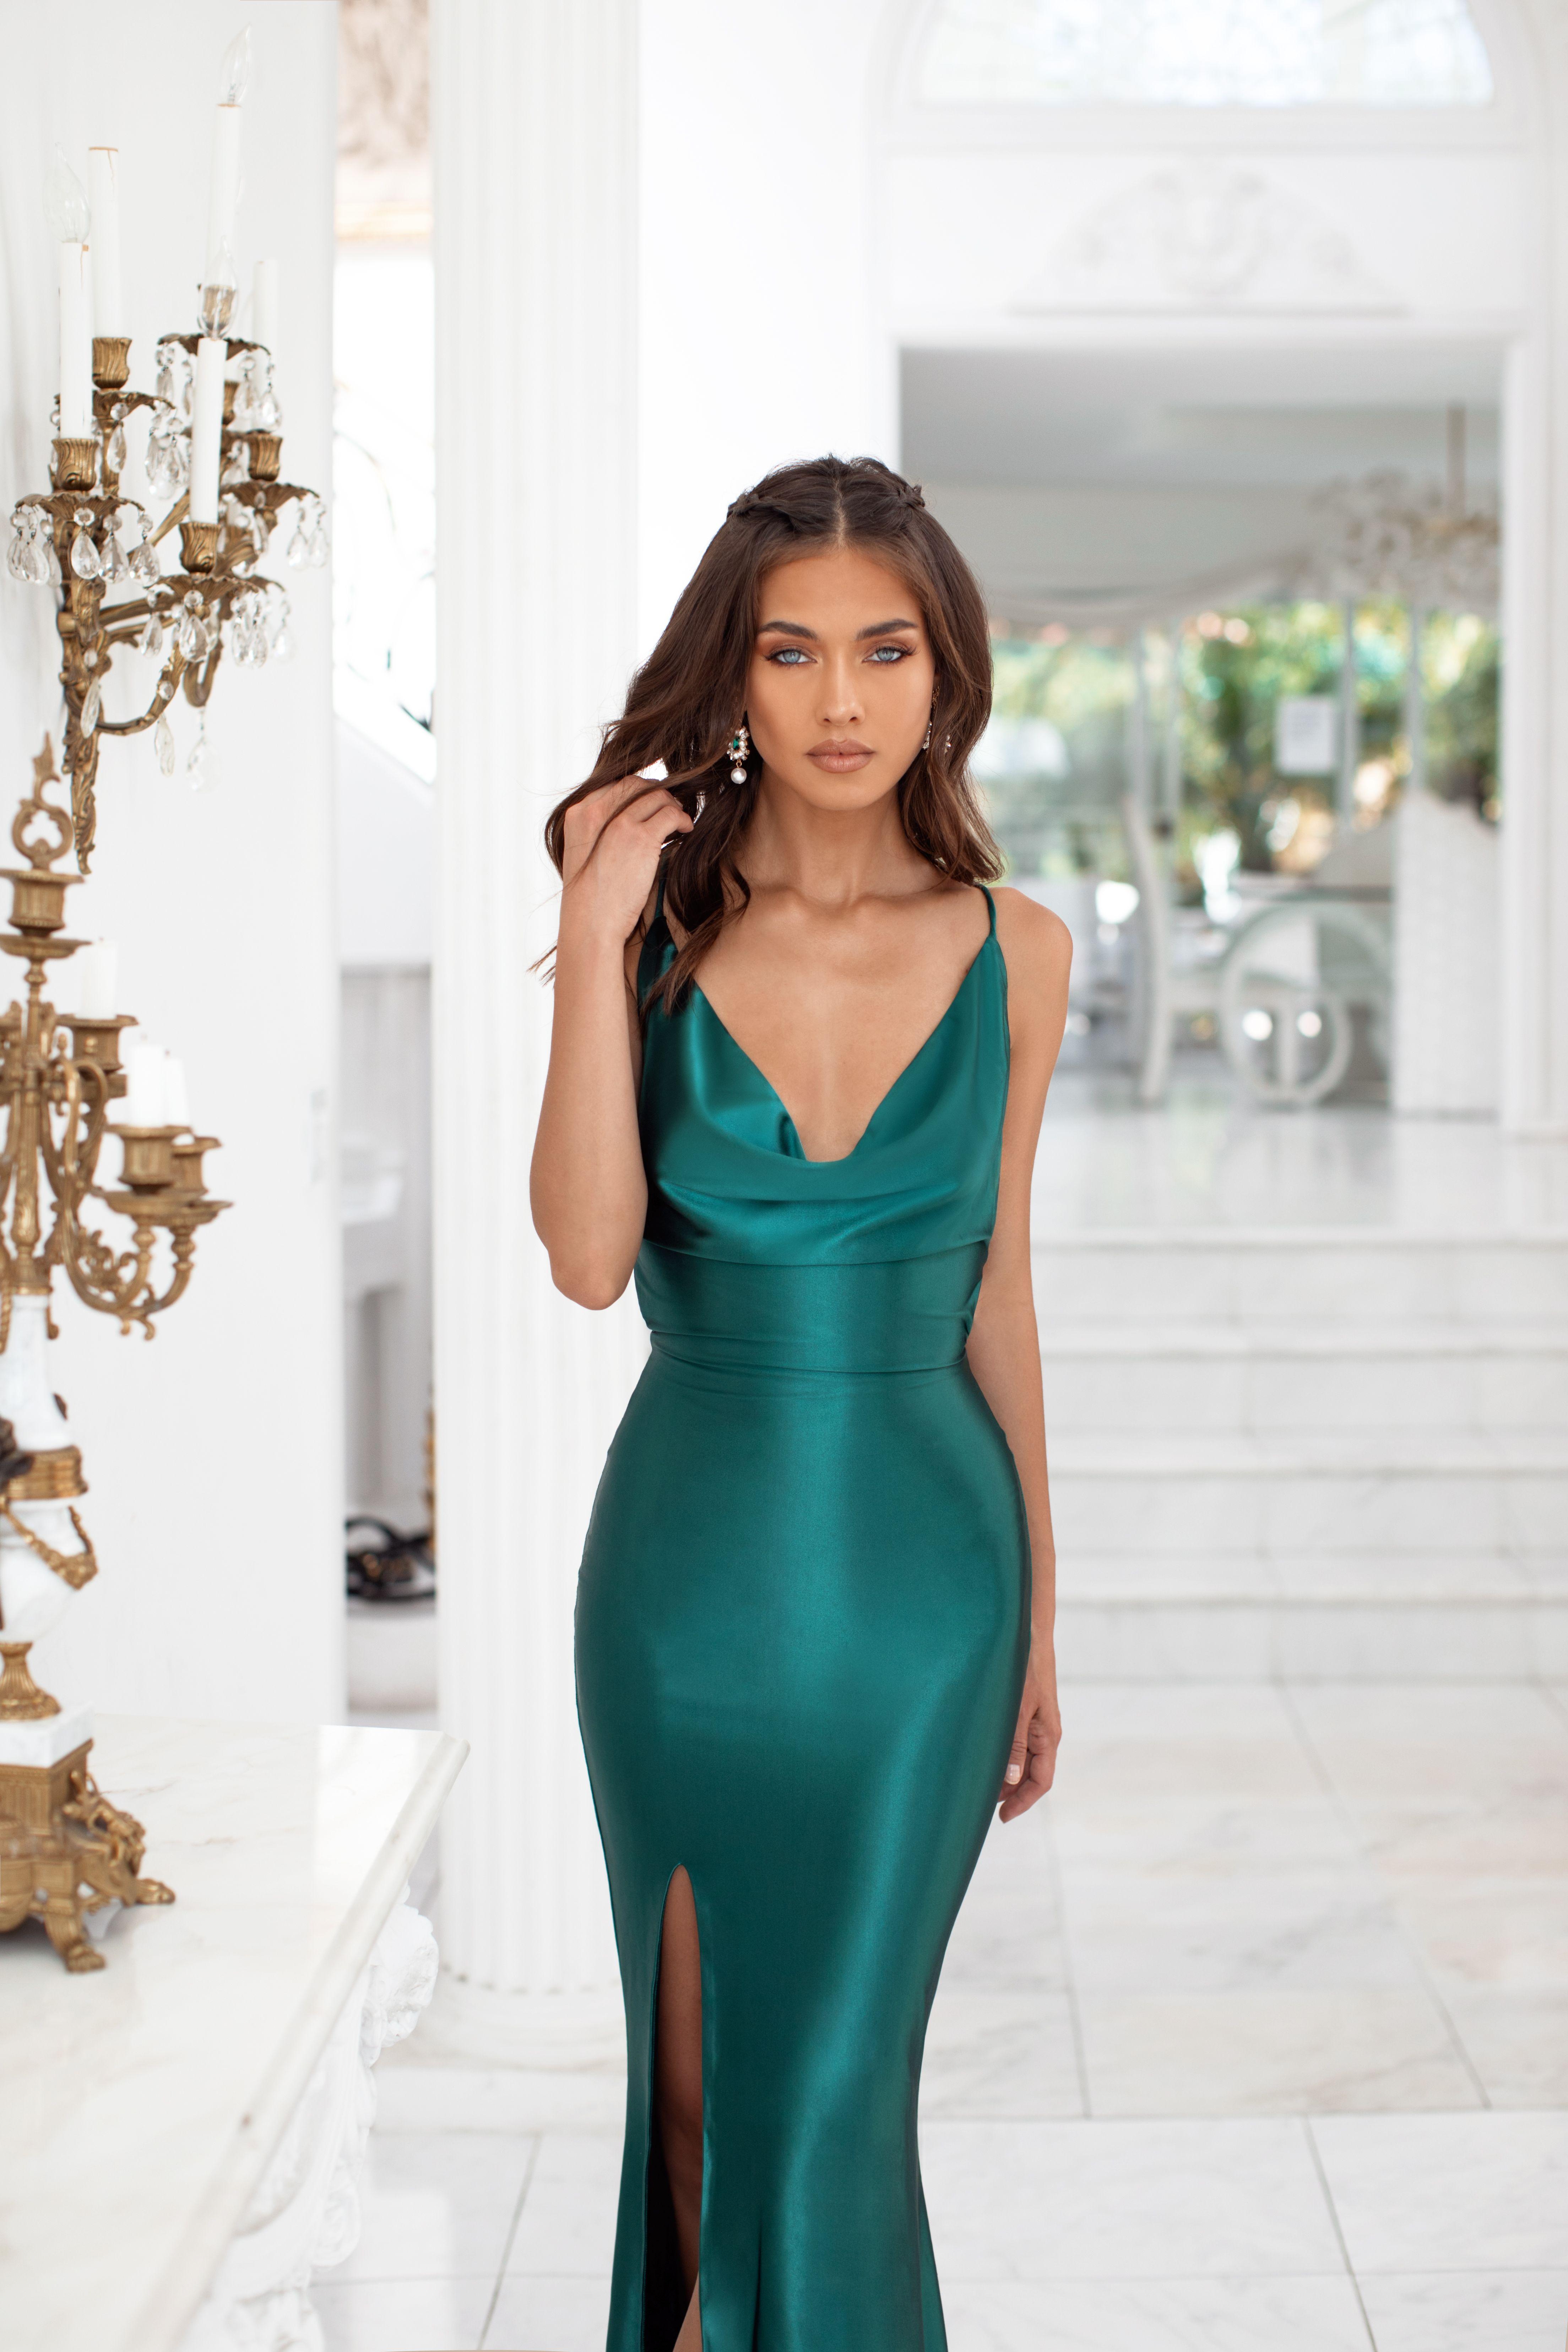 Desirae Emerald In 2020 Green Formal Dresses Emerald Green Formal Dress Green Ball Dresses